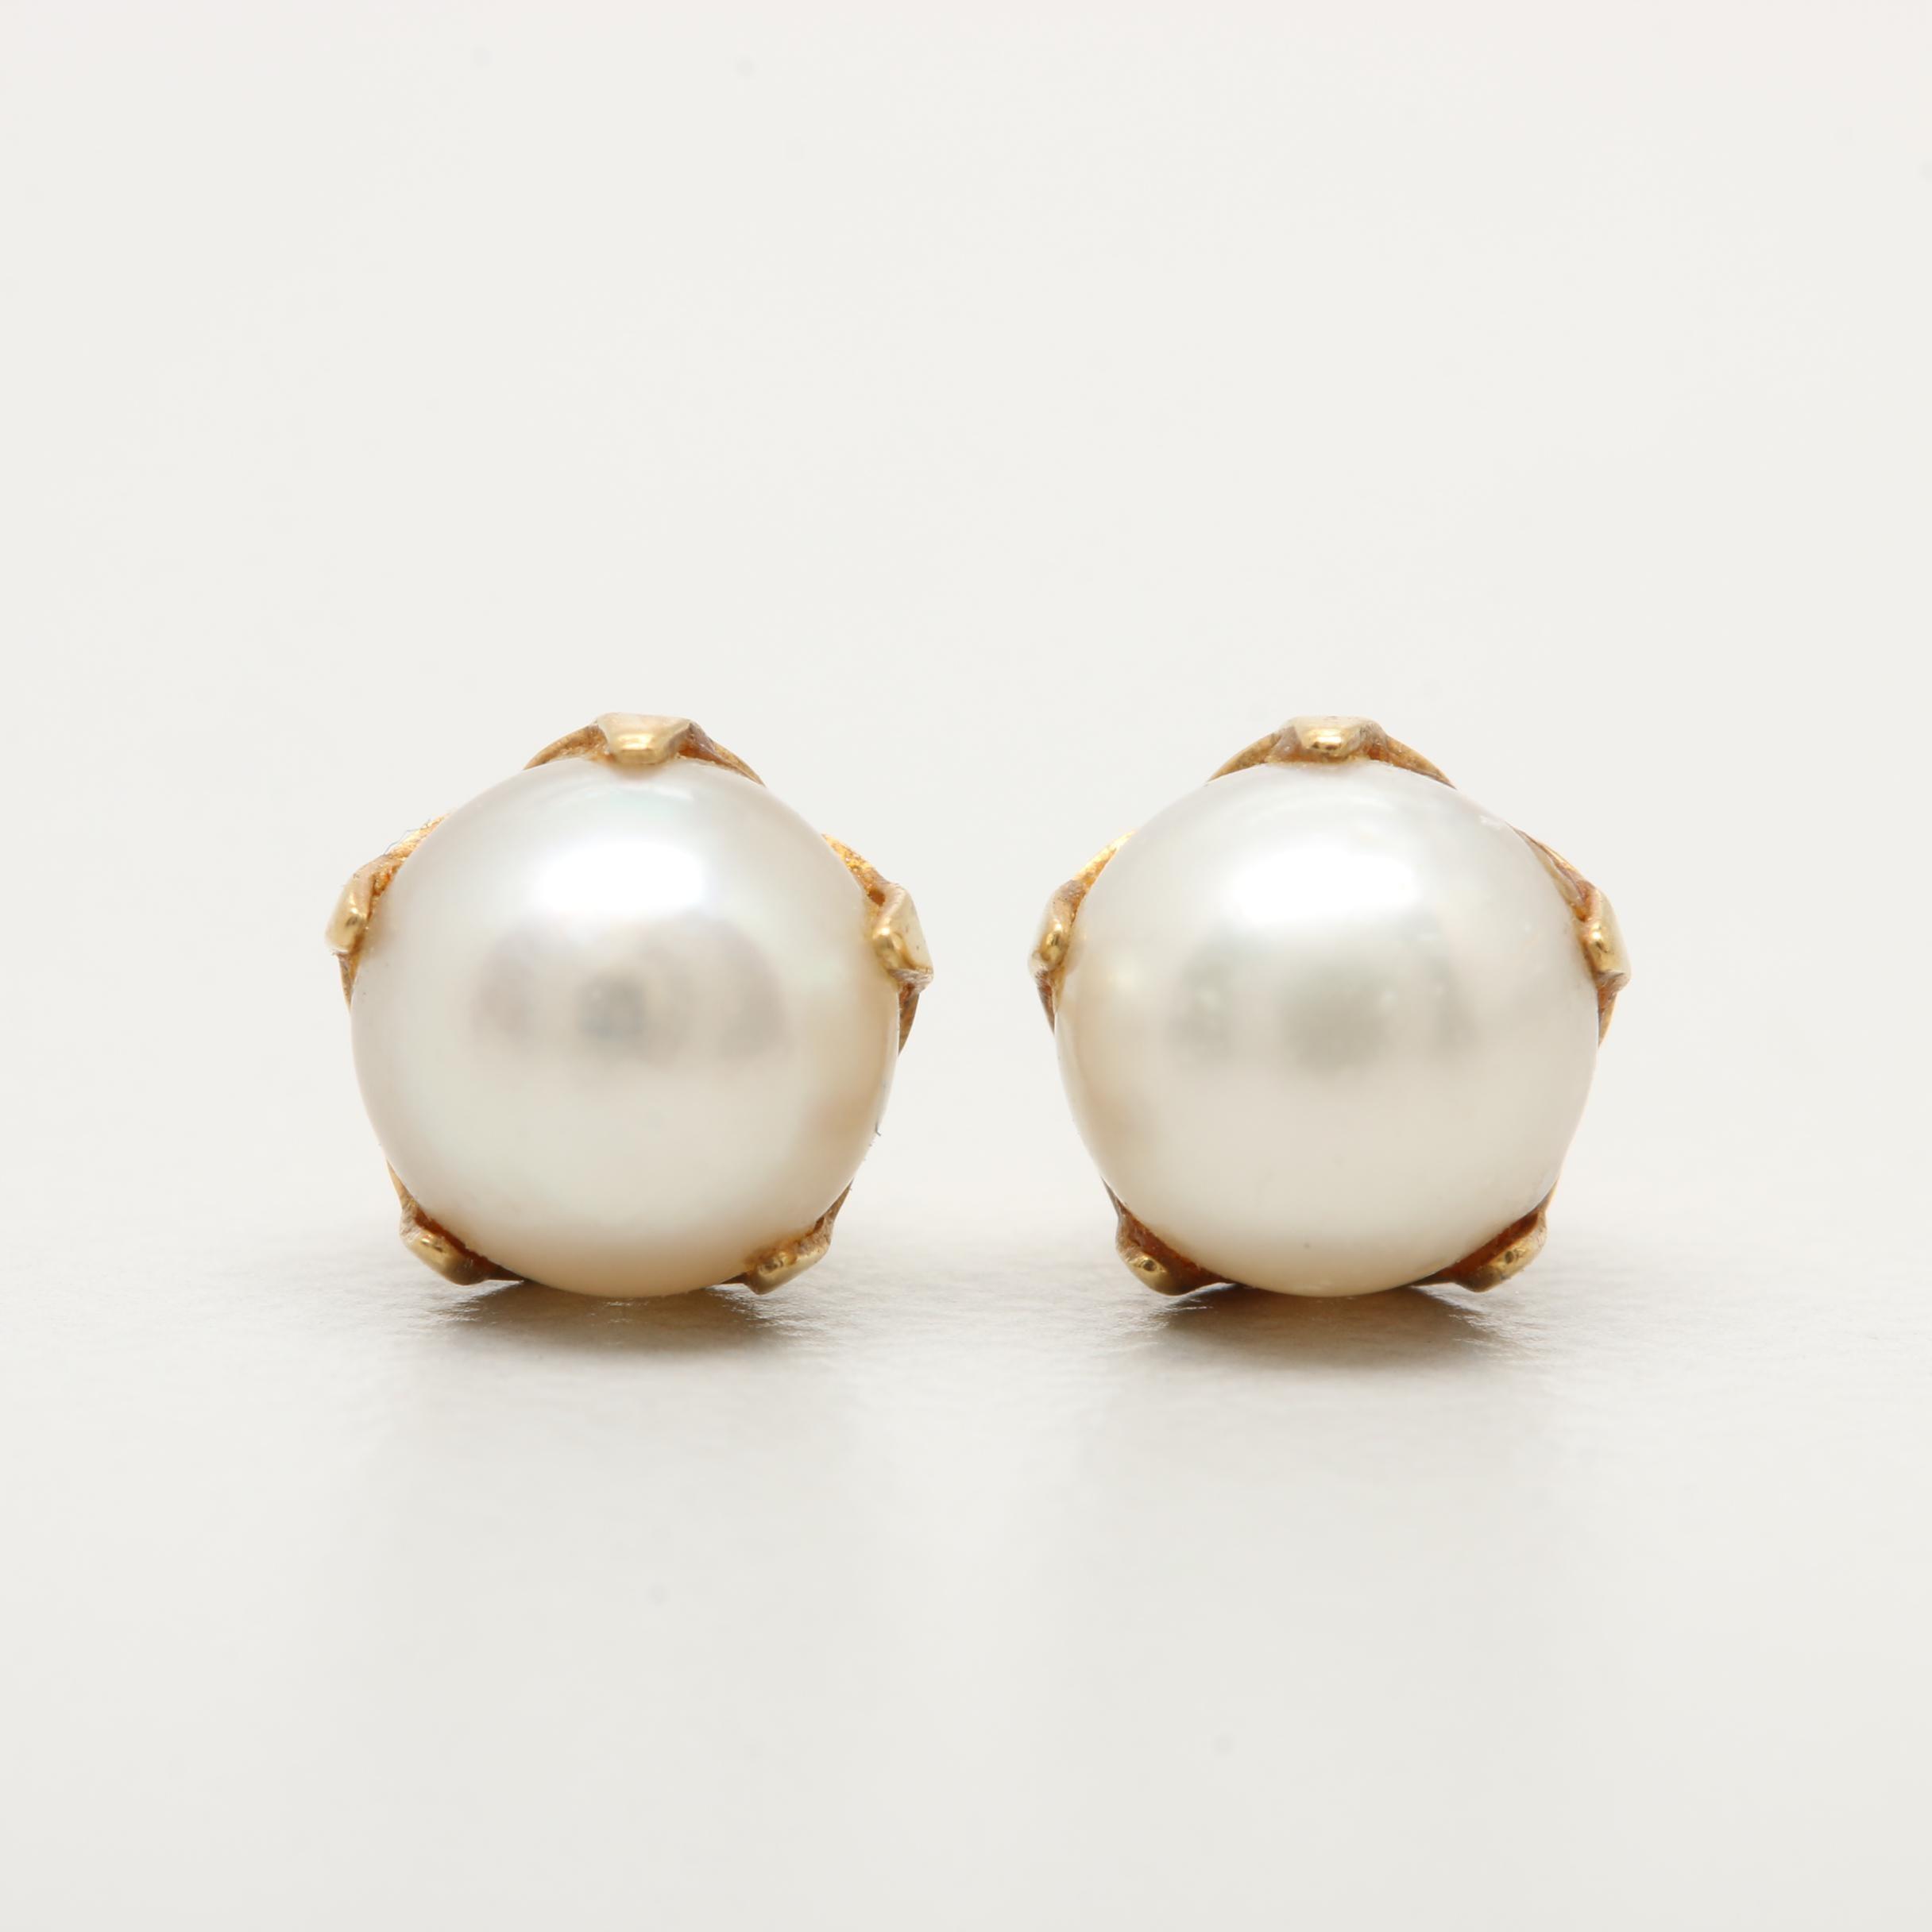 14K Yellow Gold Cultured Pearl Earrings